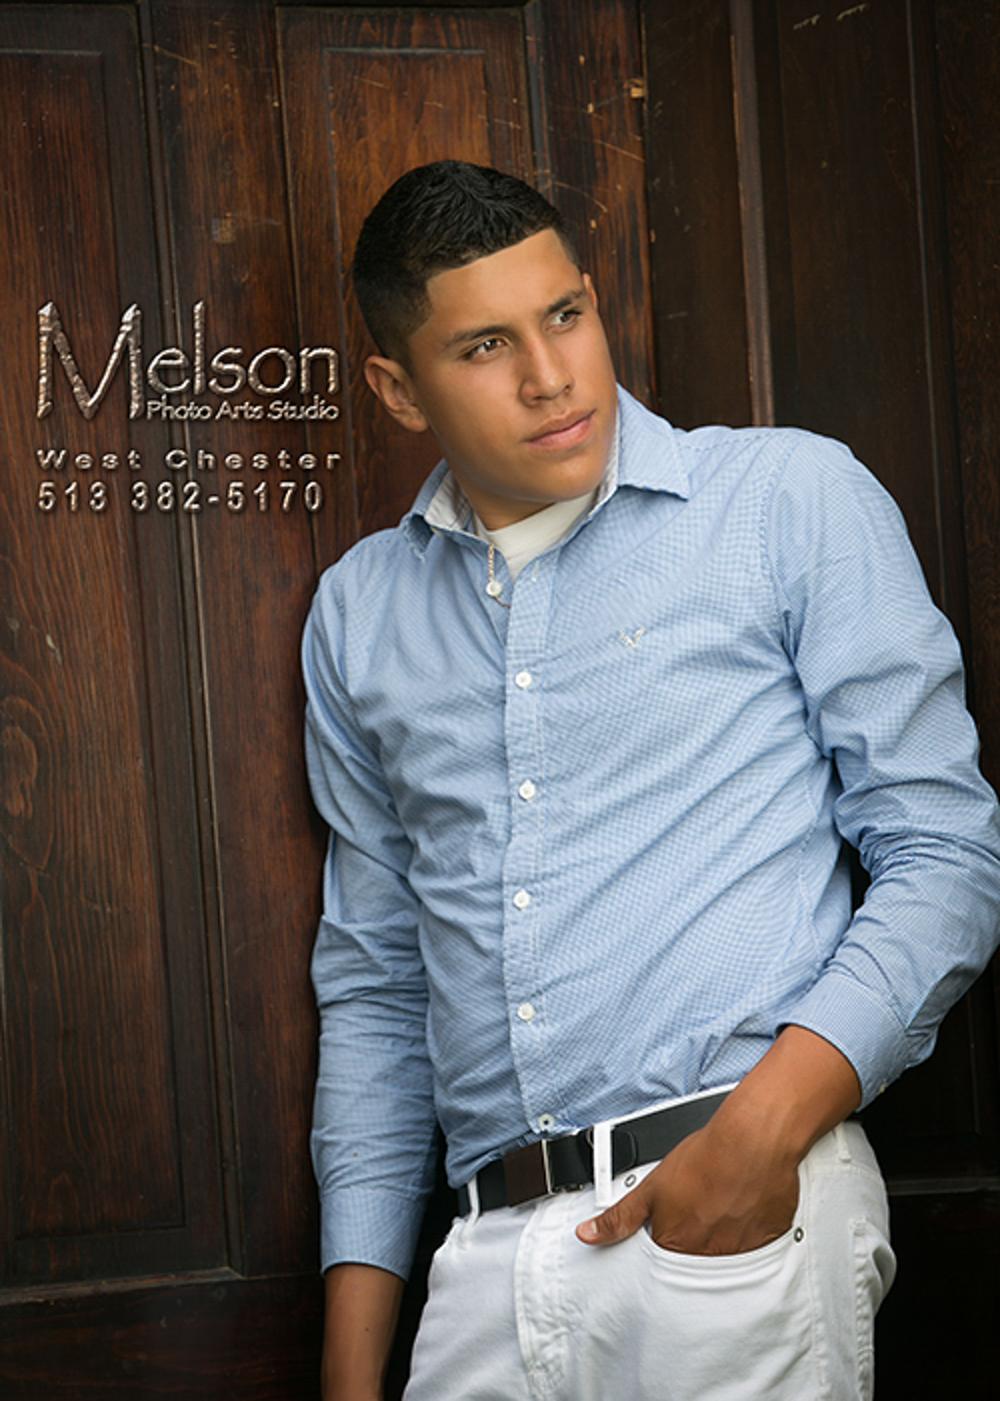 Jose_5254FB.jpg